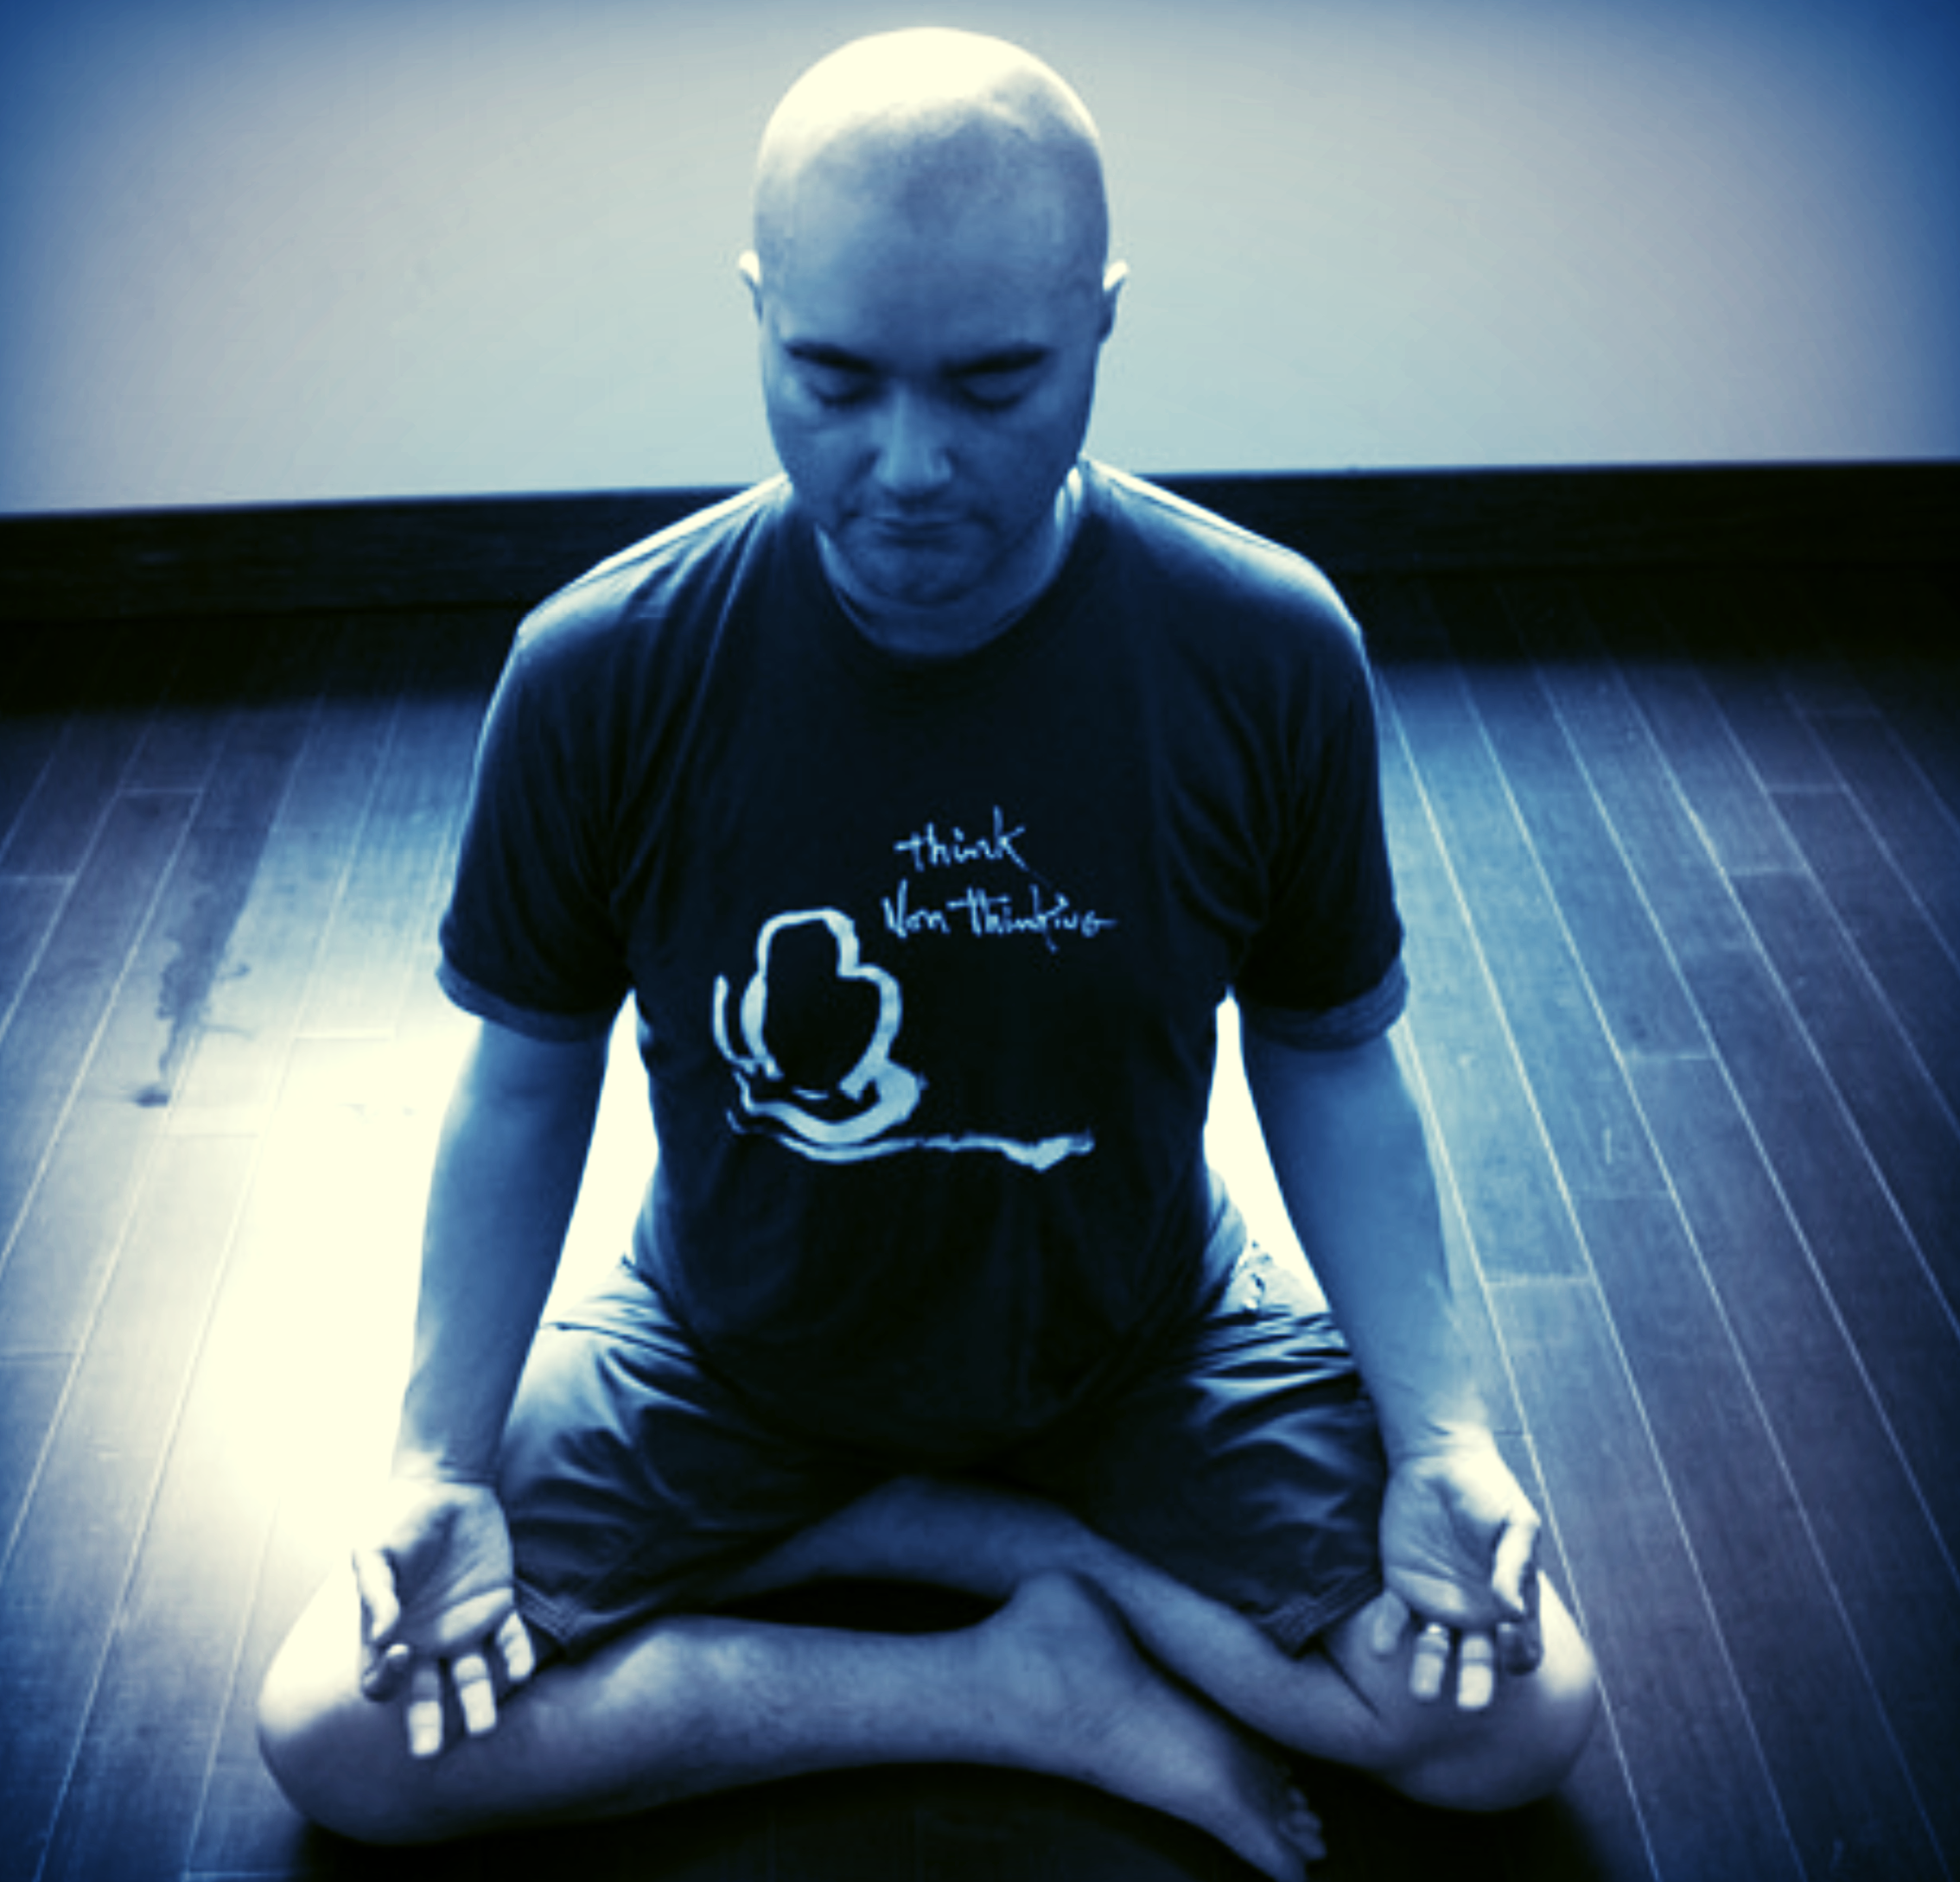 Zen Meditation: Think Non-Thinking